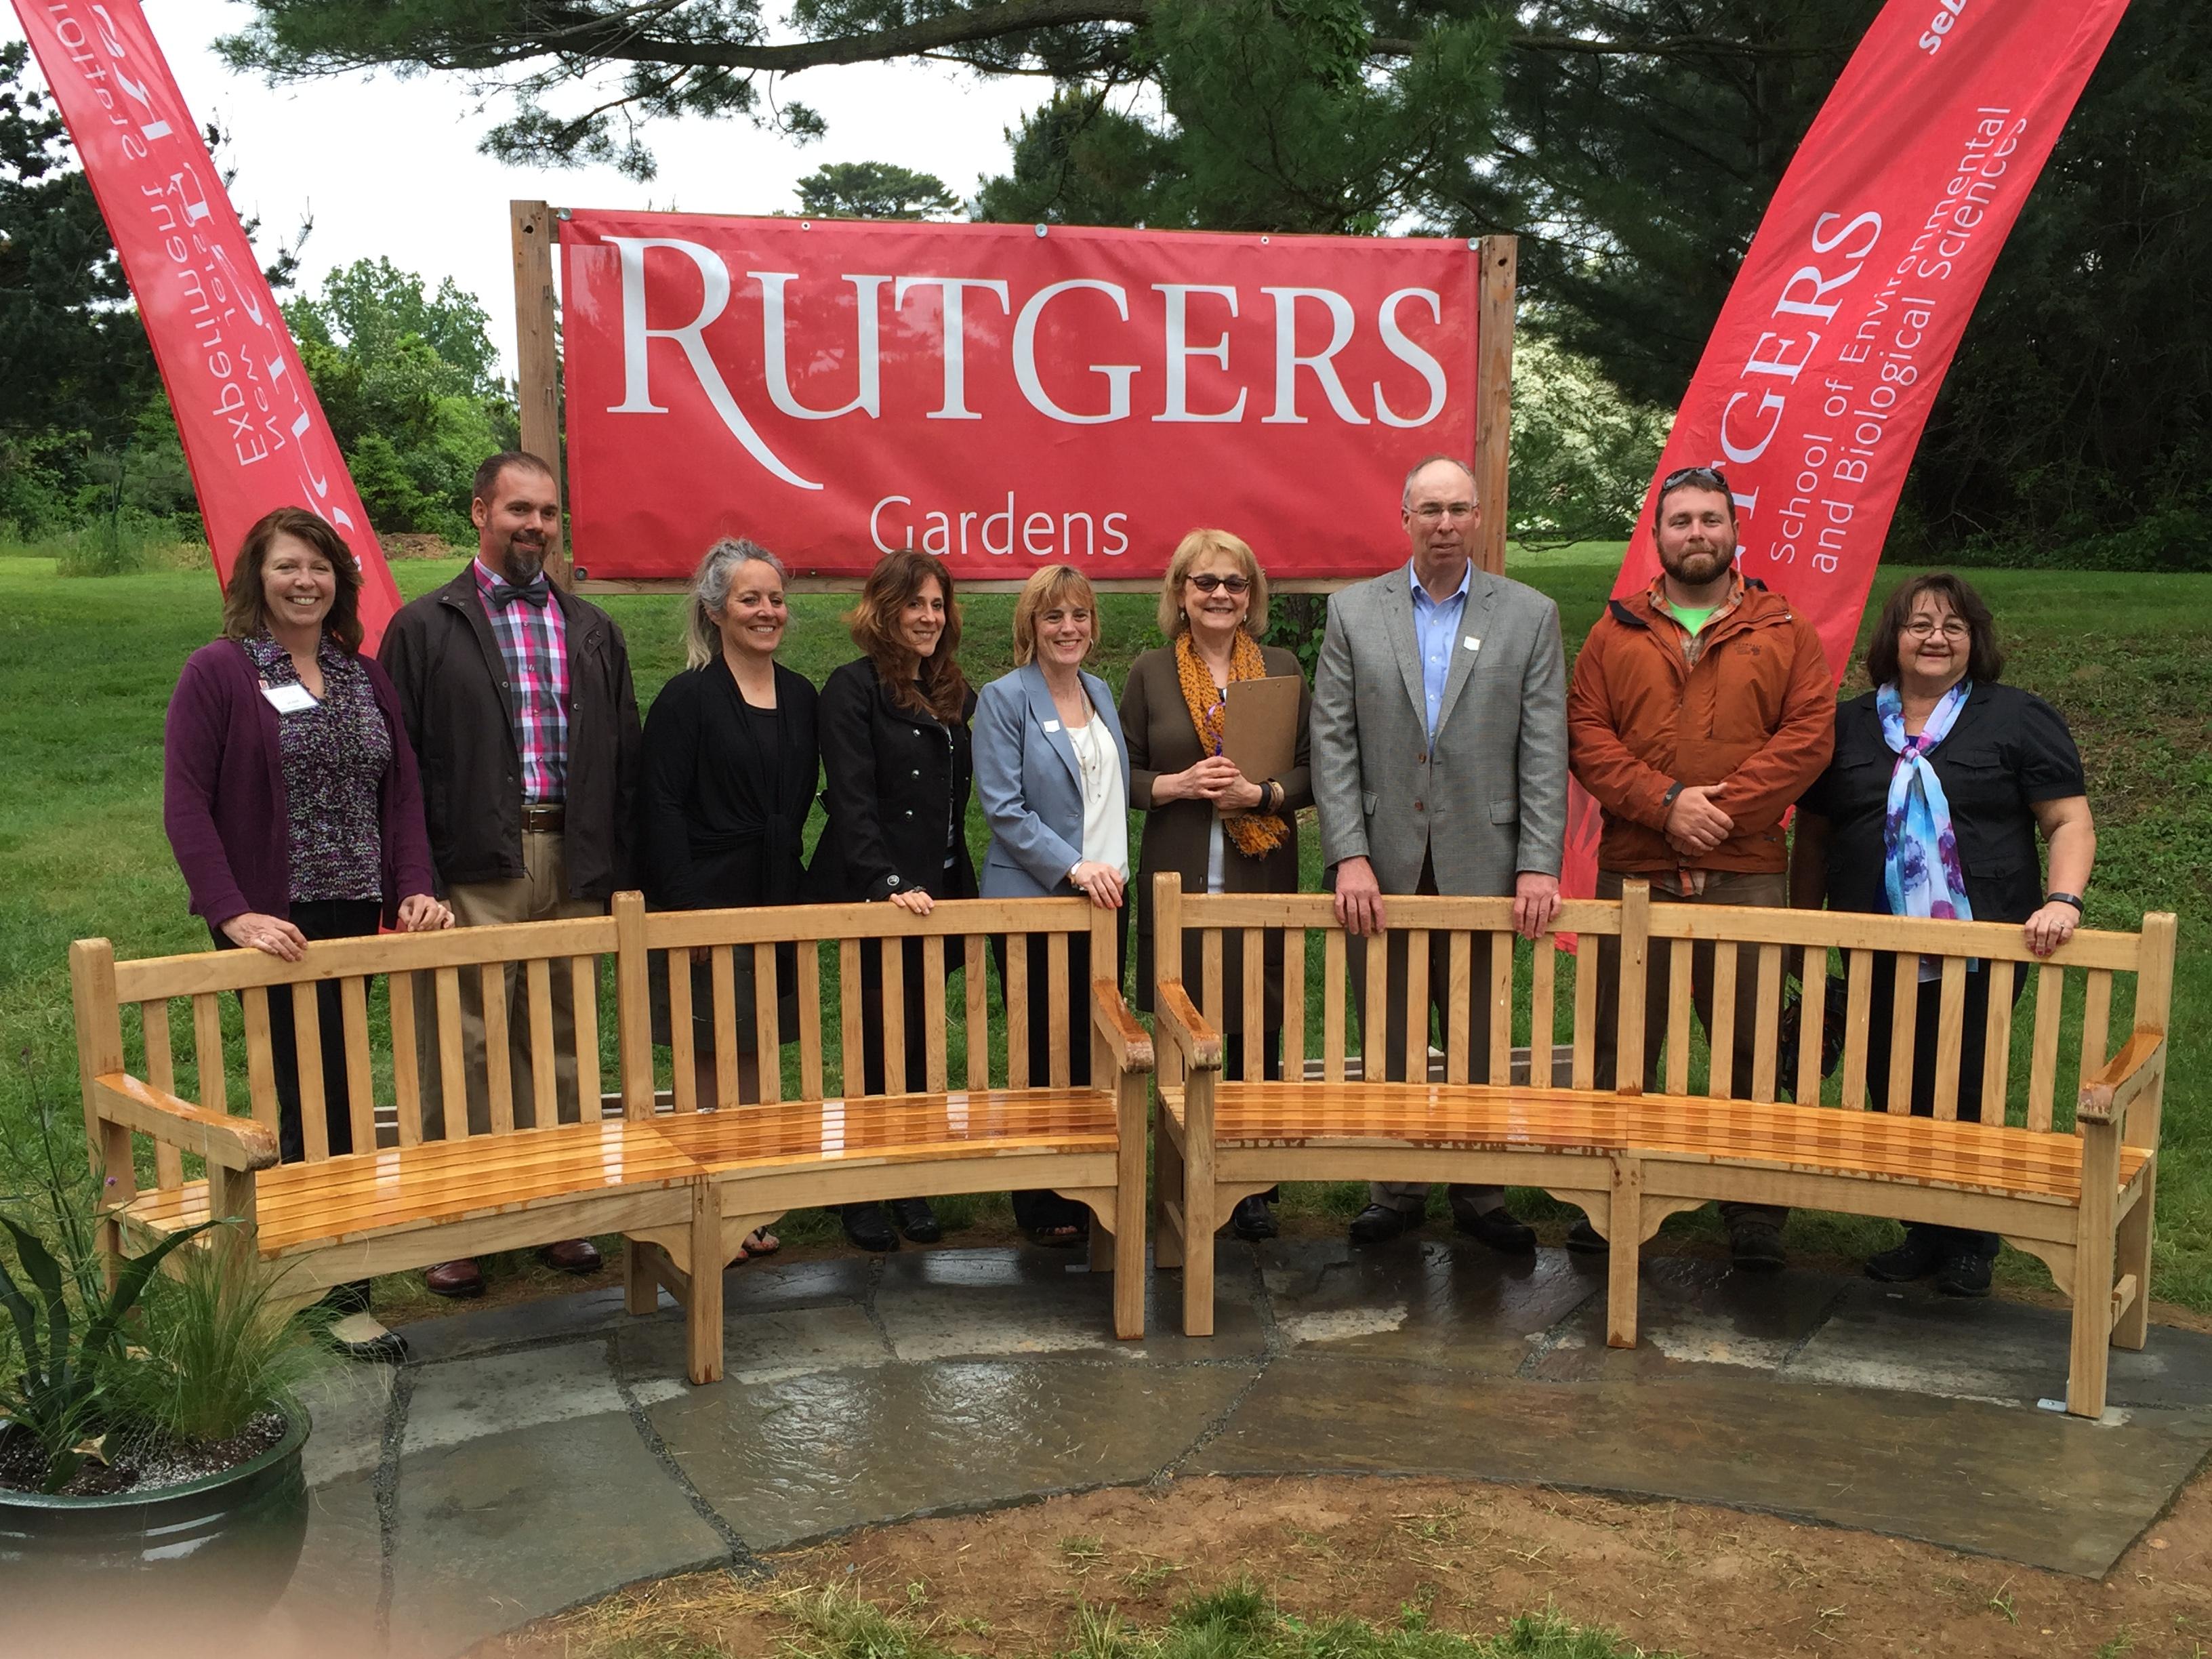 f07505a9a232fe81ff96_Rutgers_Garden_Ceremony_007.JPG